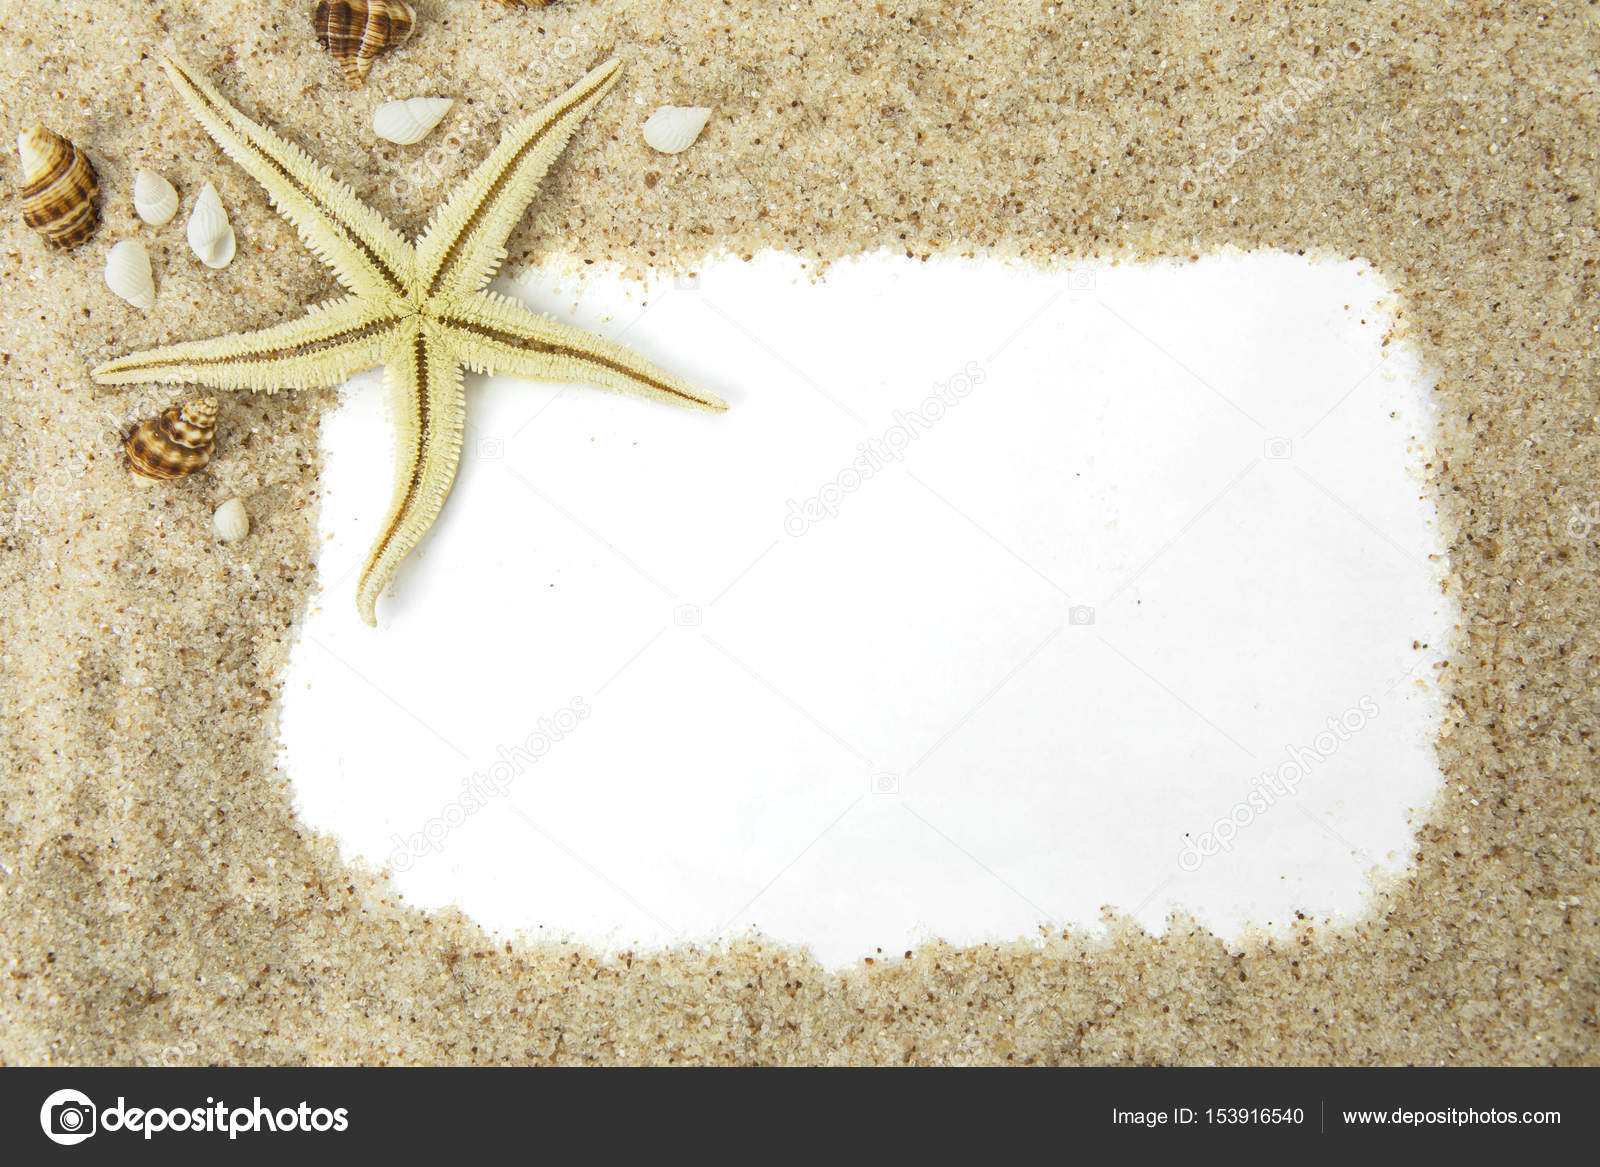 Starfish with sand frame — Stock Photo © realinemedia #153916540